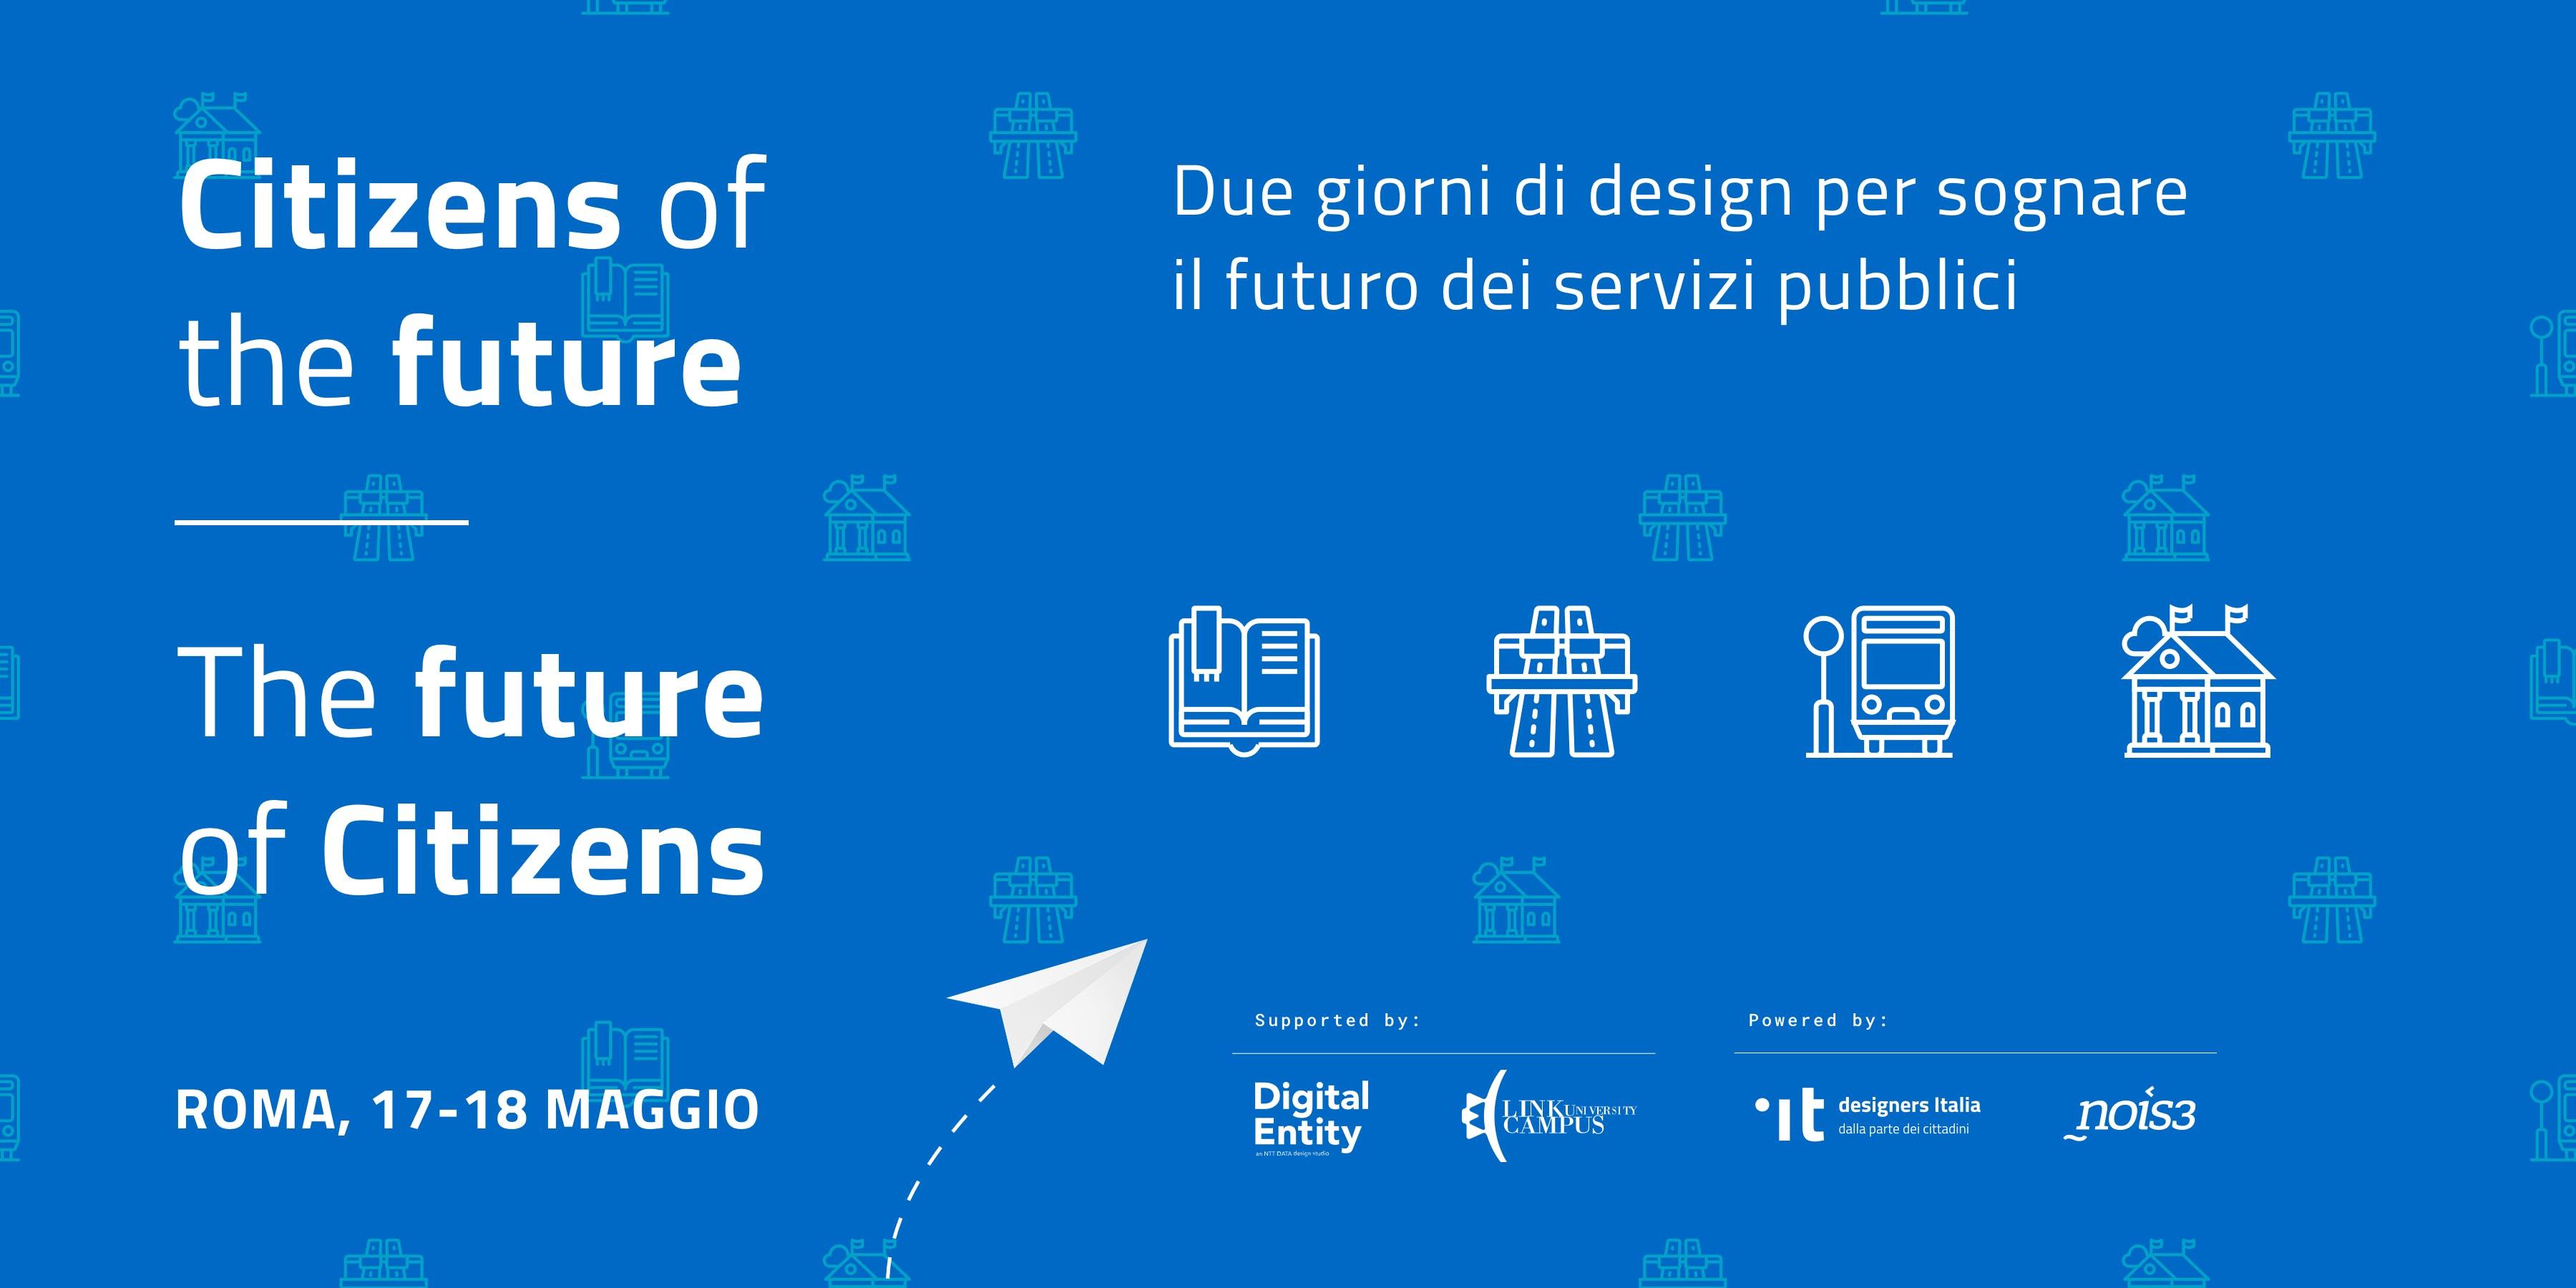 Citizens of the future / The future of citizens - Rome